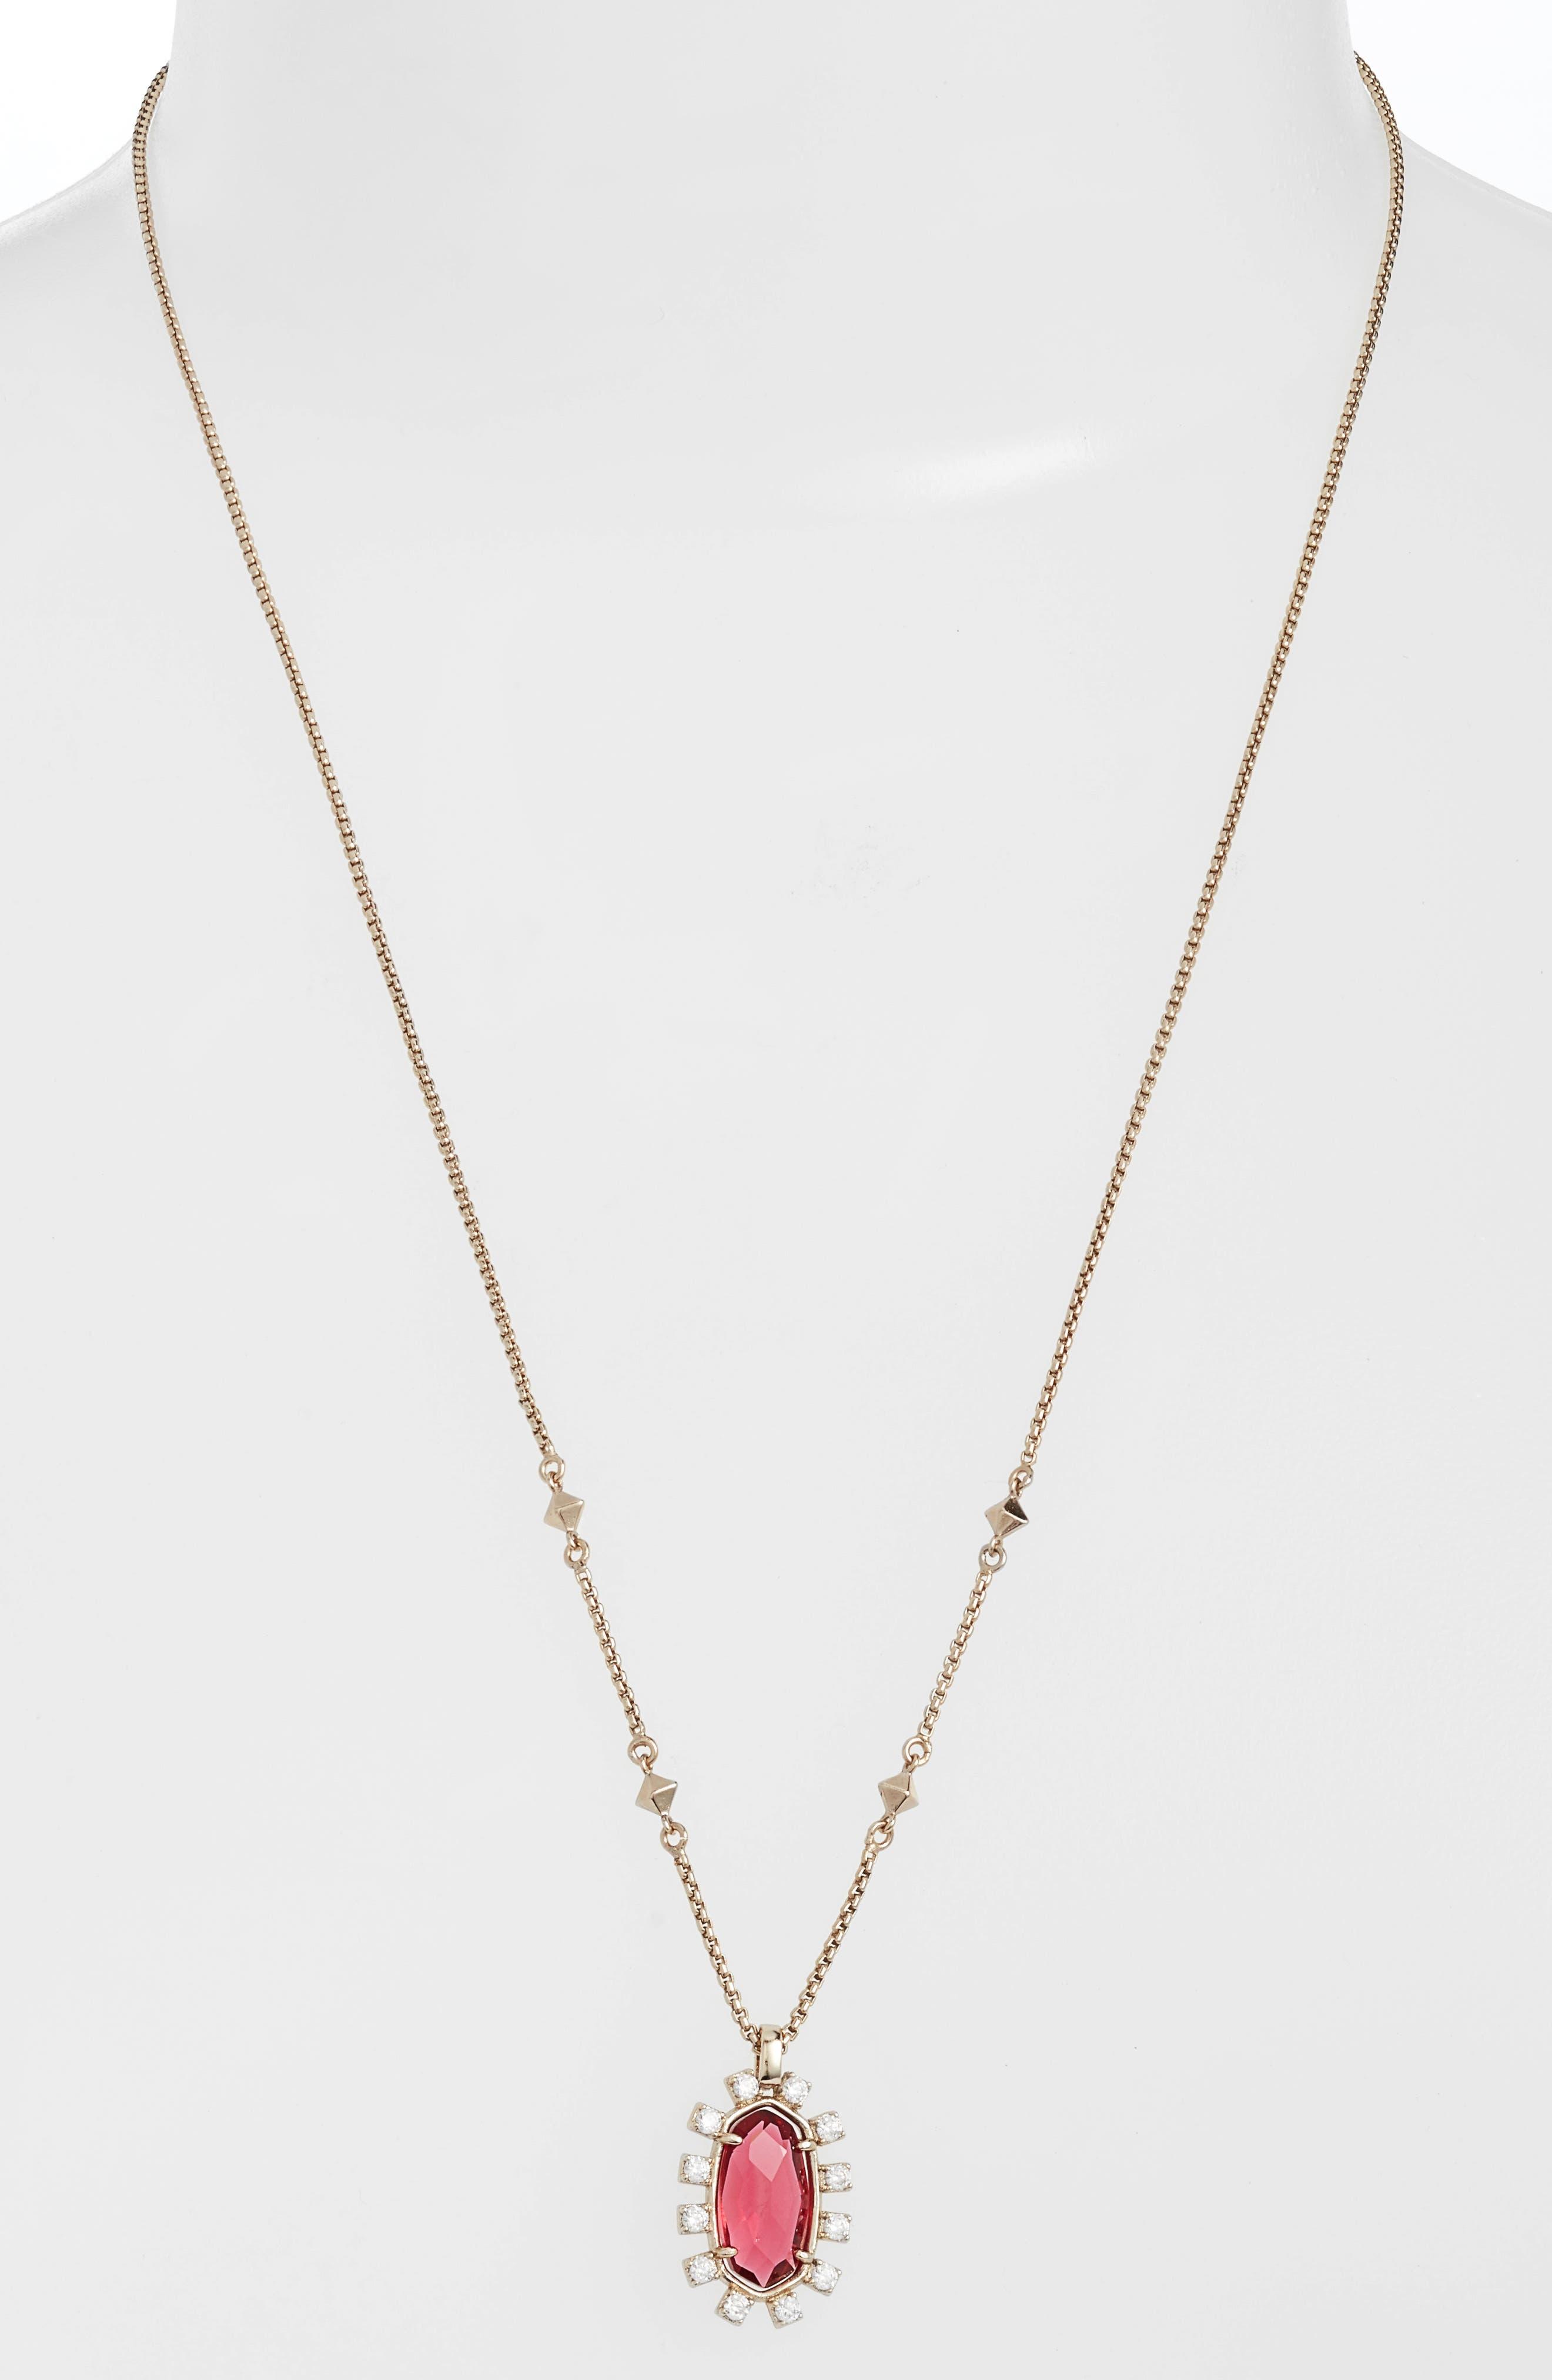 Alternate Image 1 Selected - Kendra Scott Convertible Pendant Necklace